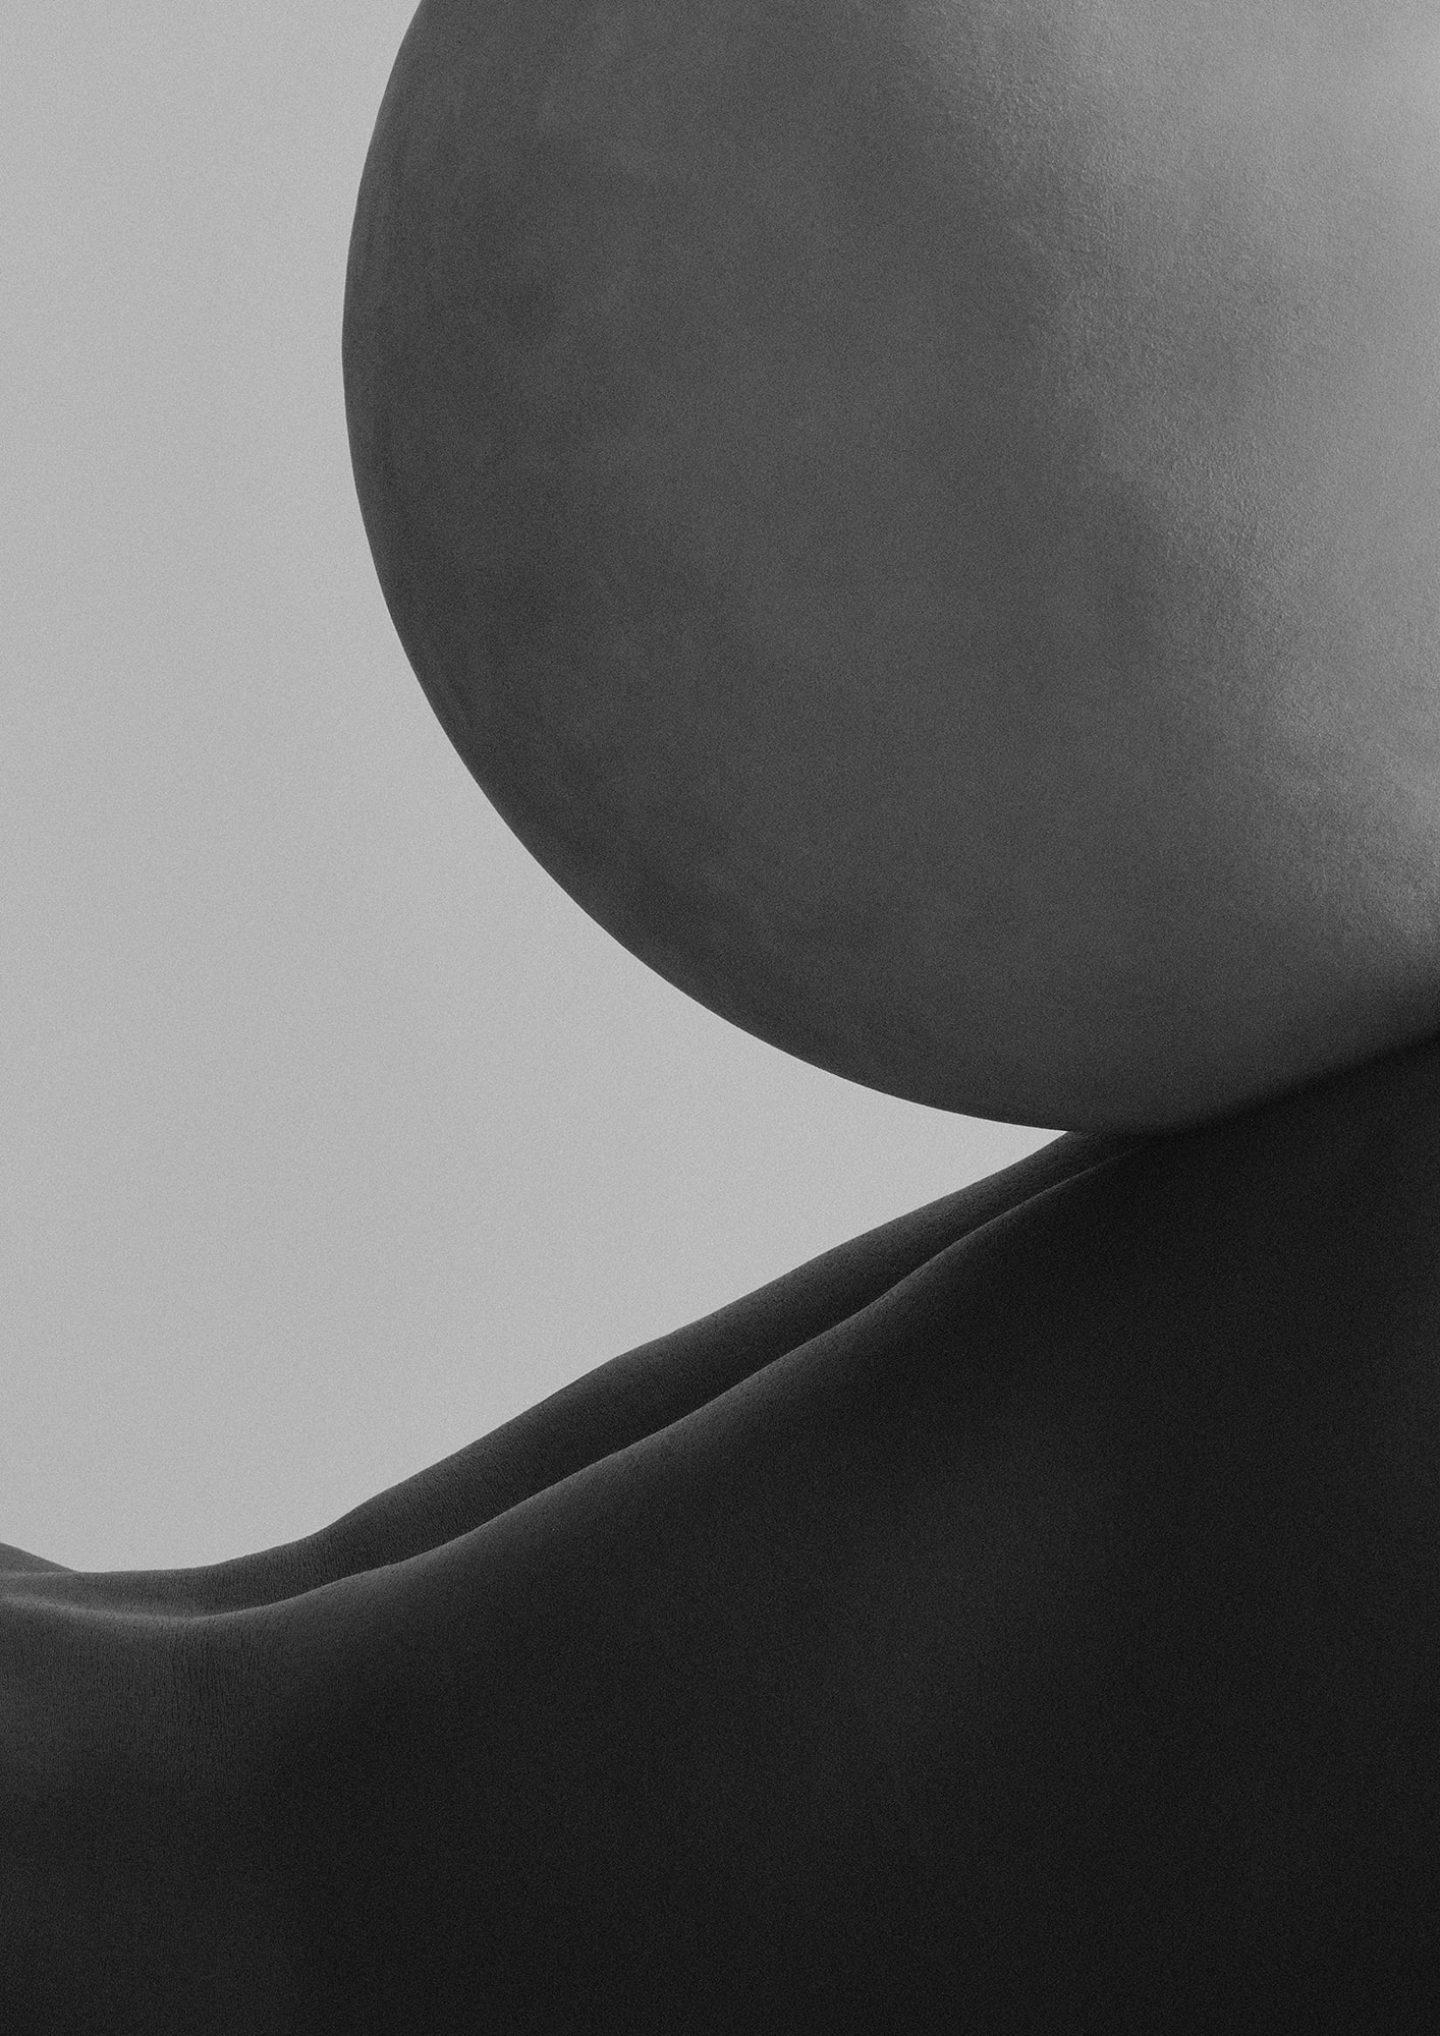 IGNANT-Jonas-Bjerre-Poulsen-Reinvention-of-Forms-015